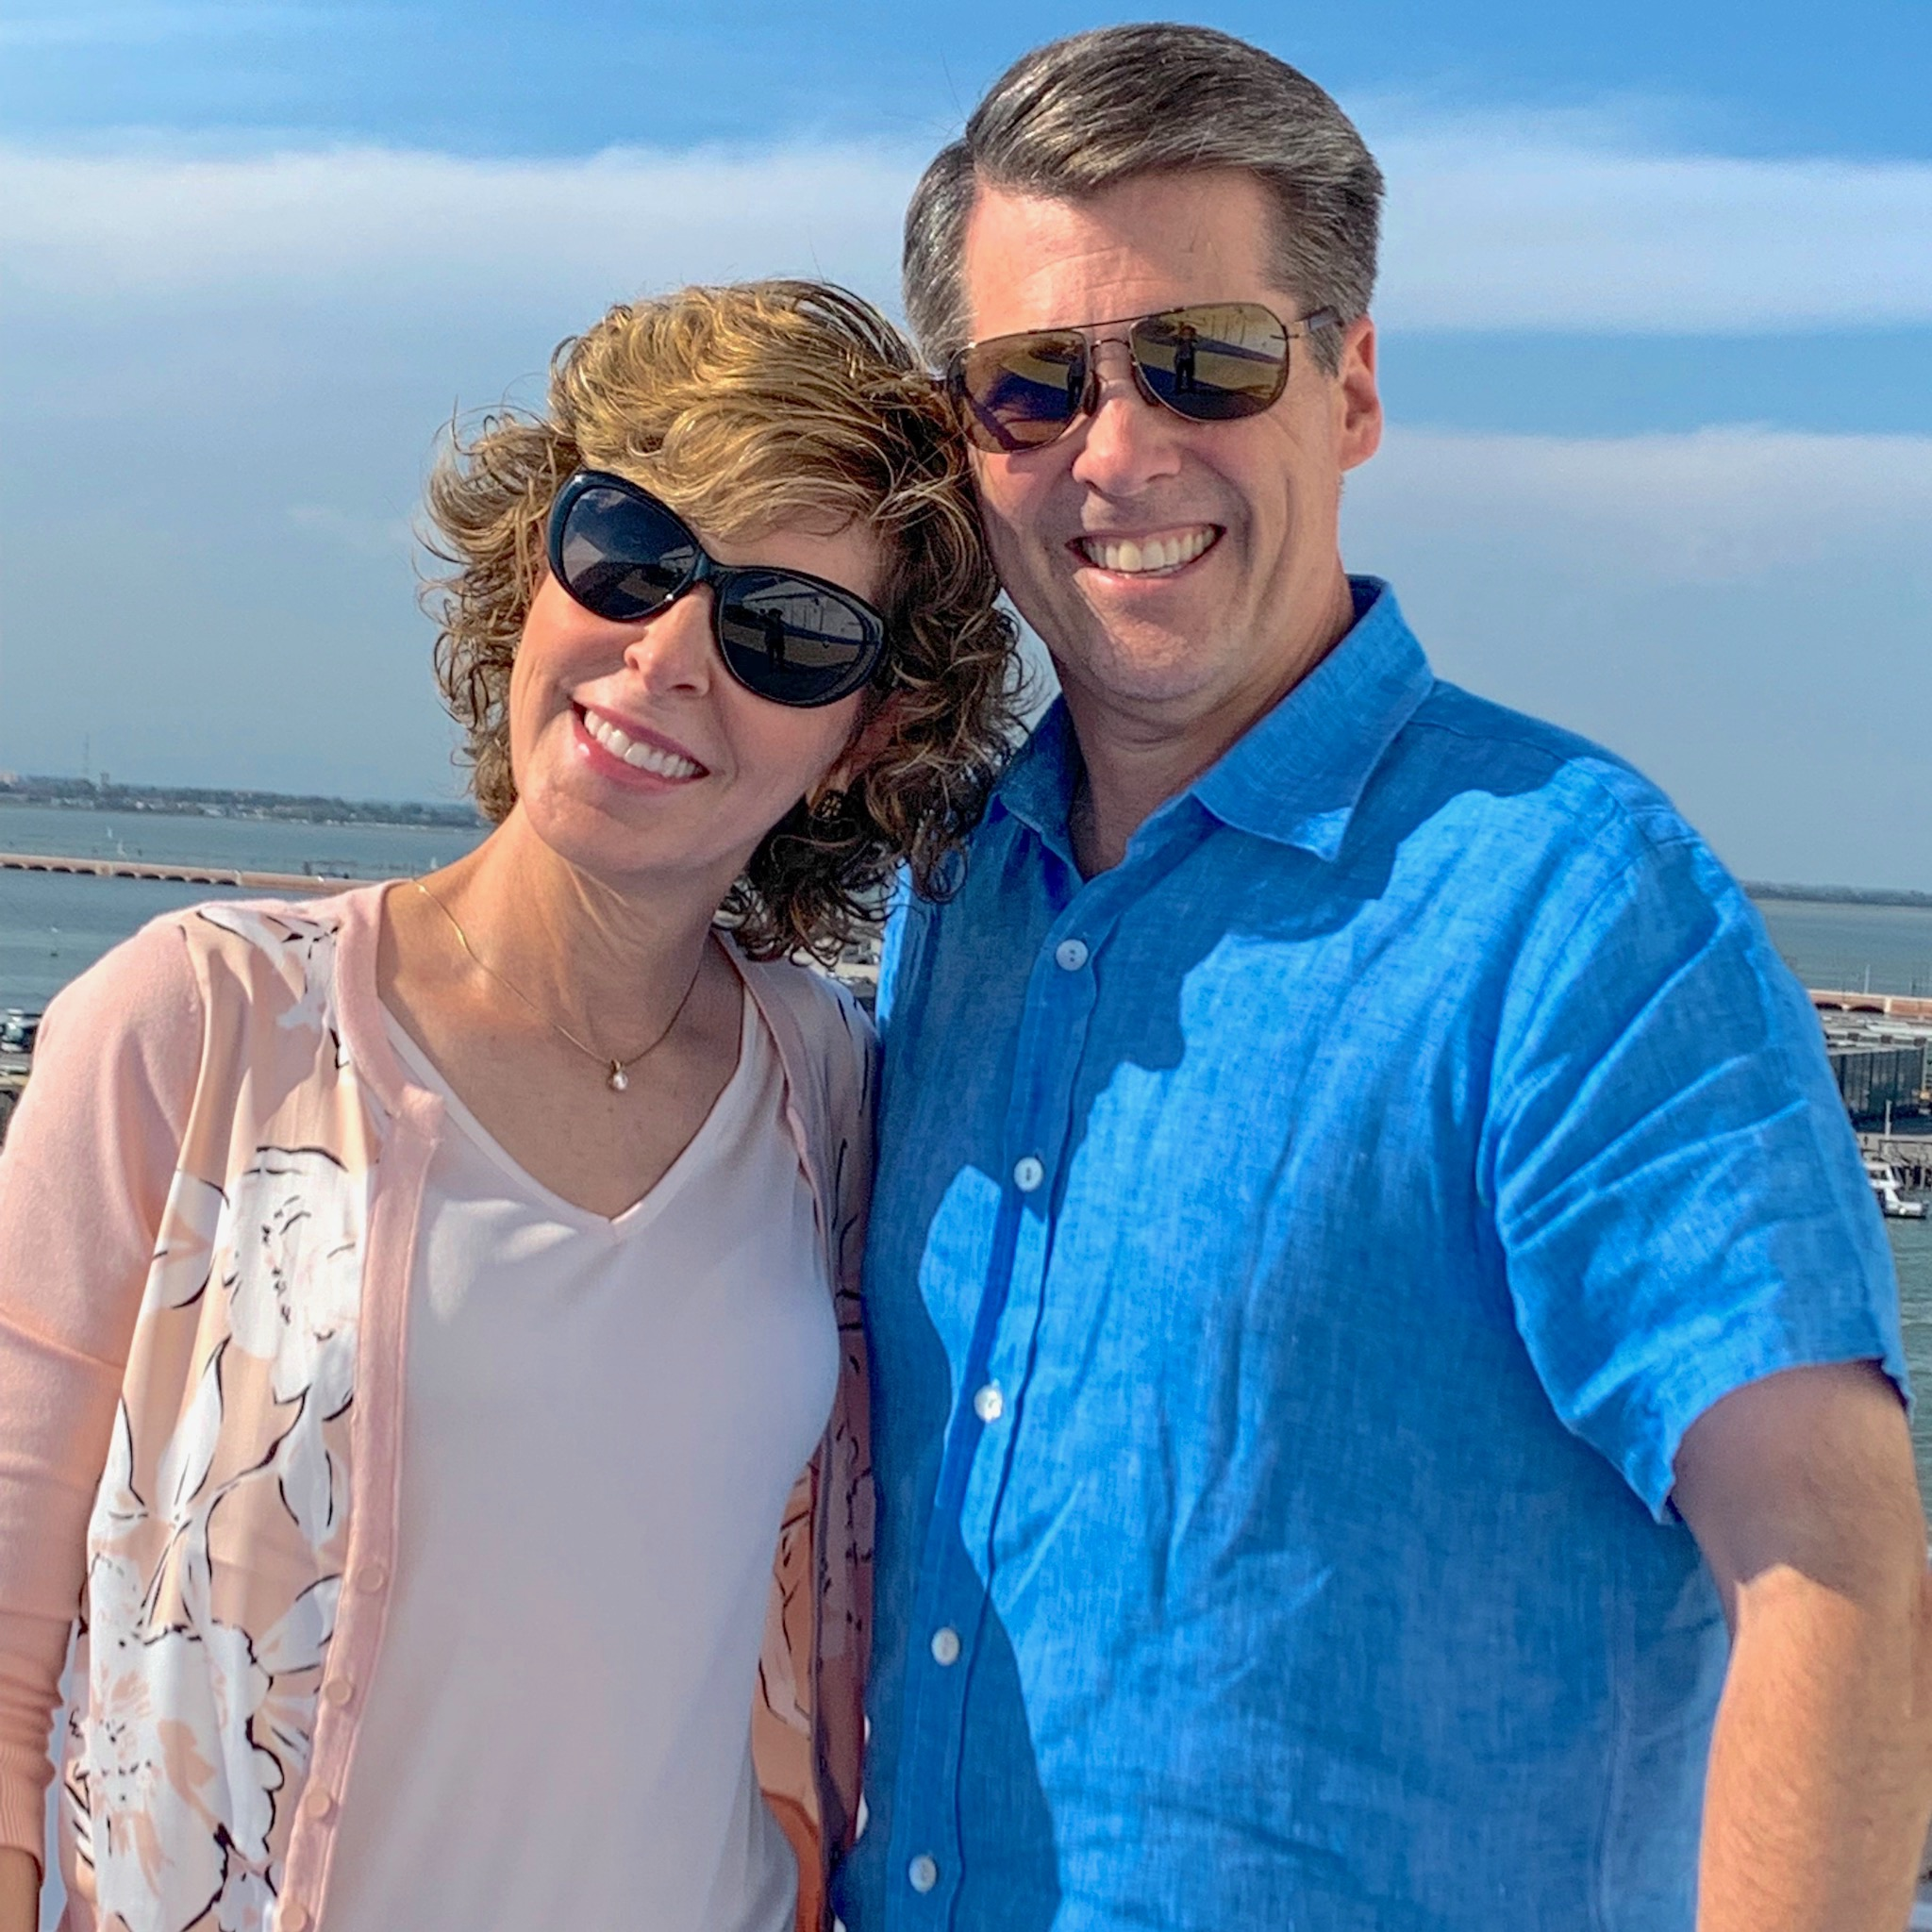 couple posing on cruise ship